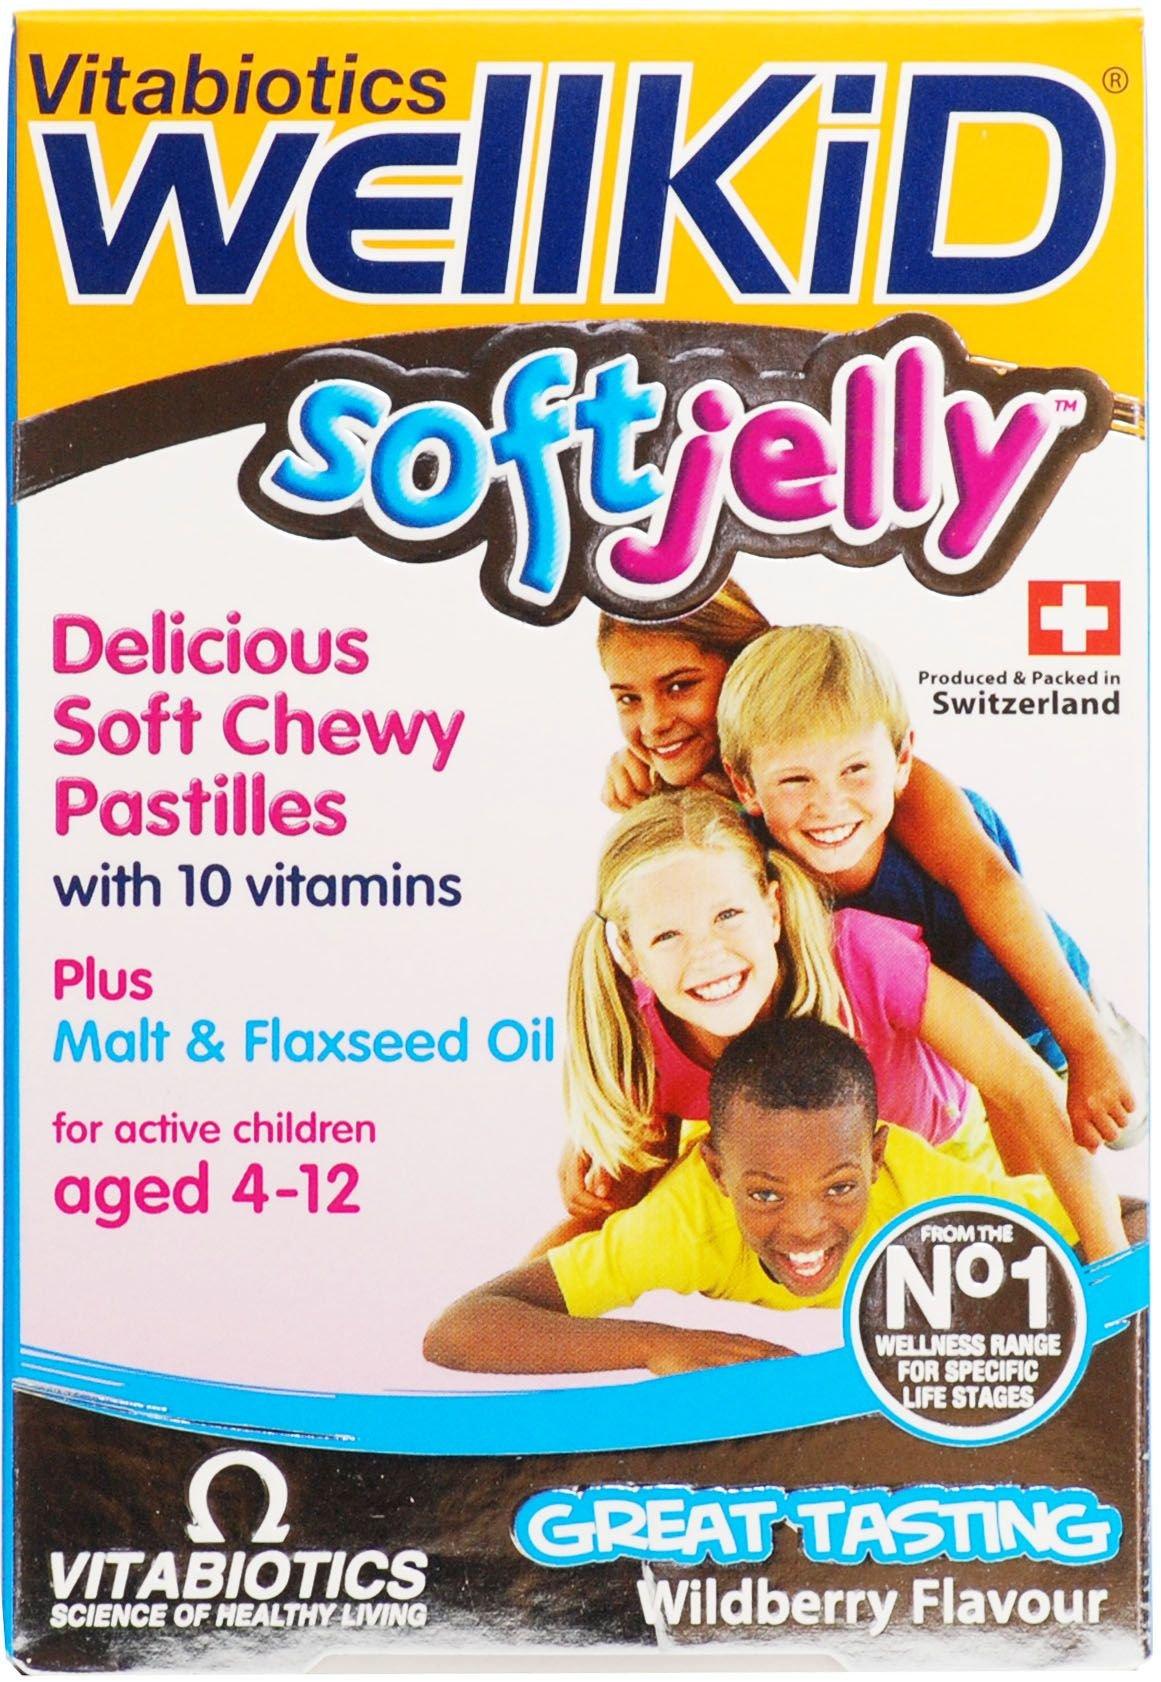 Wellkid Soft Jelly (30 Pastilles) *Bulk Pack of 12* by Vitabiotics